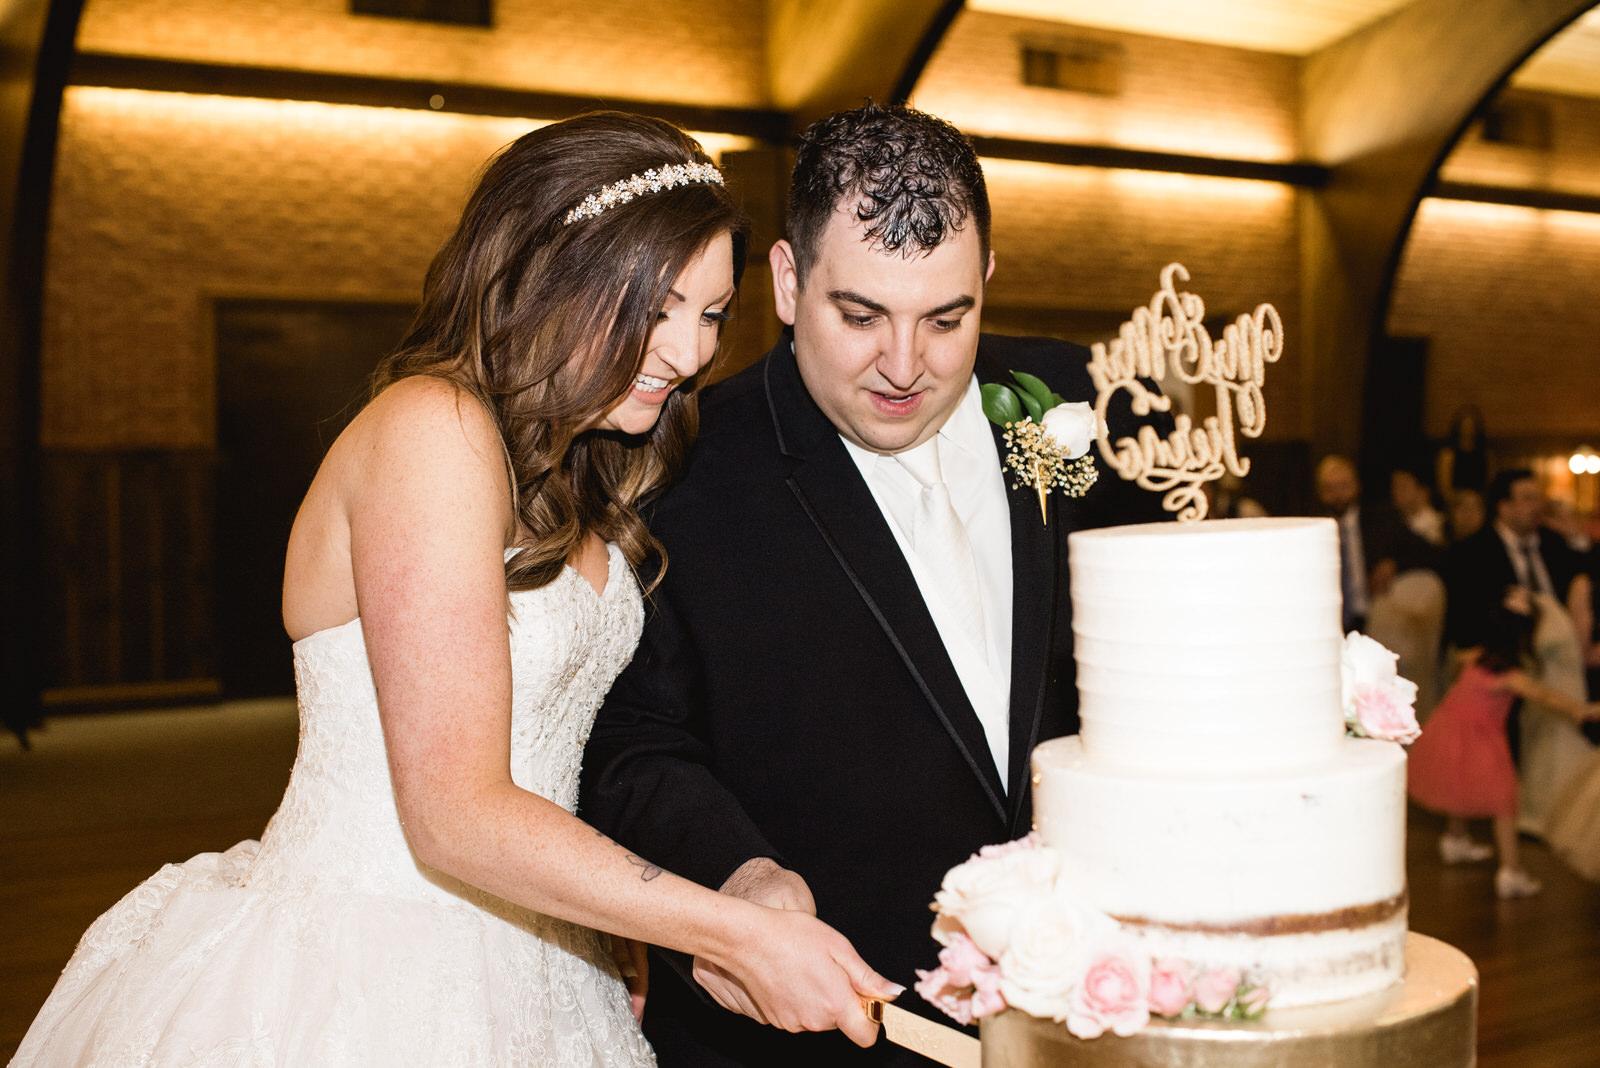 Laube_Banquet_Hall__Wedding_Photos_020.jpg